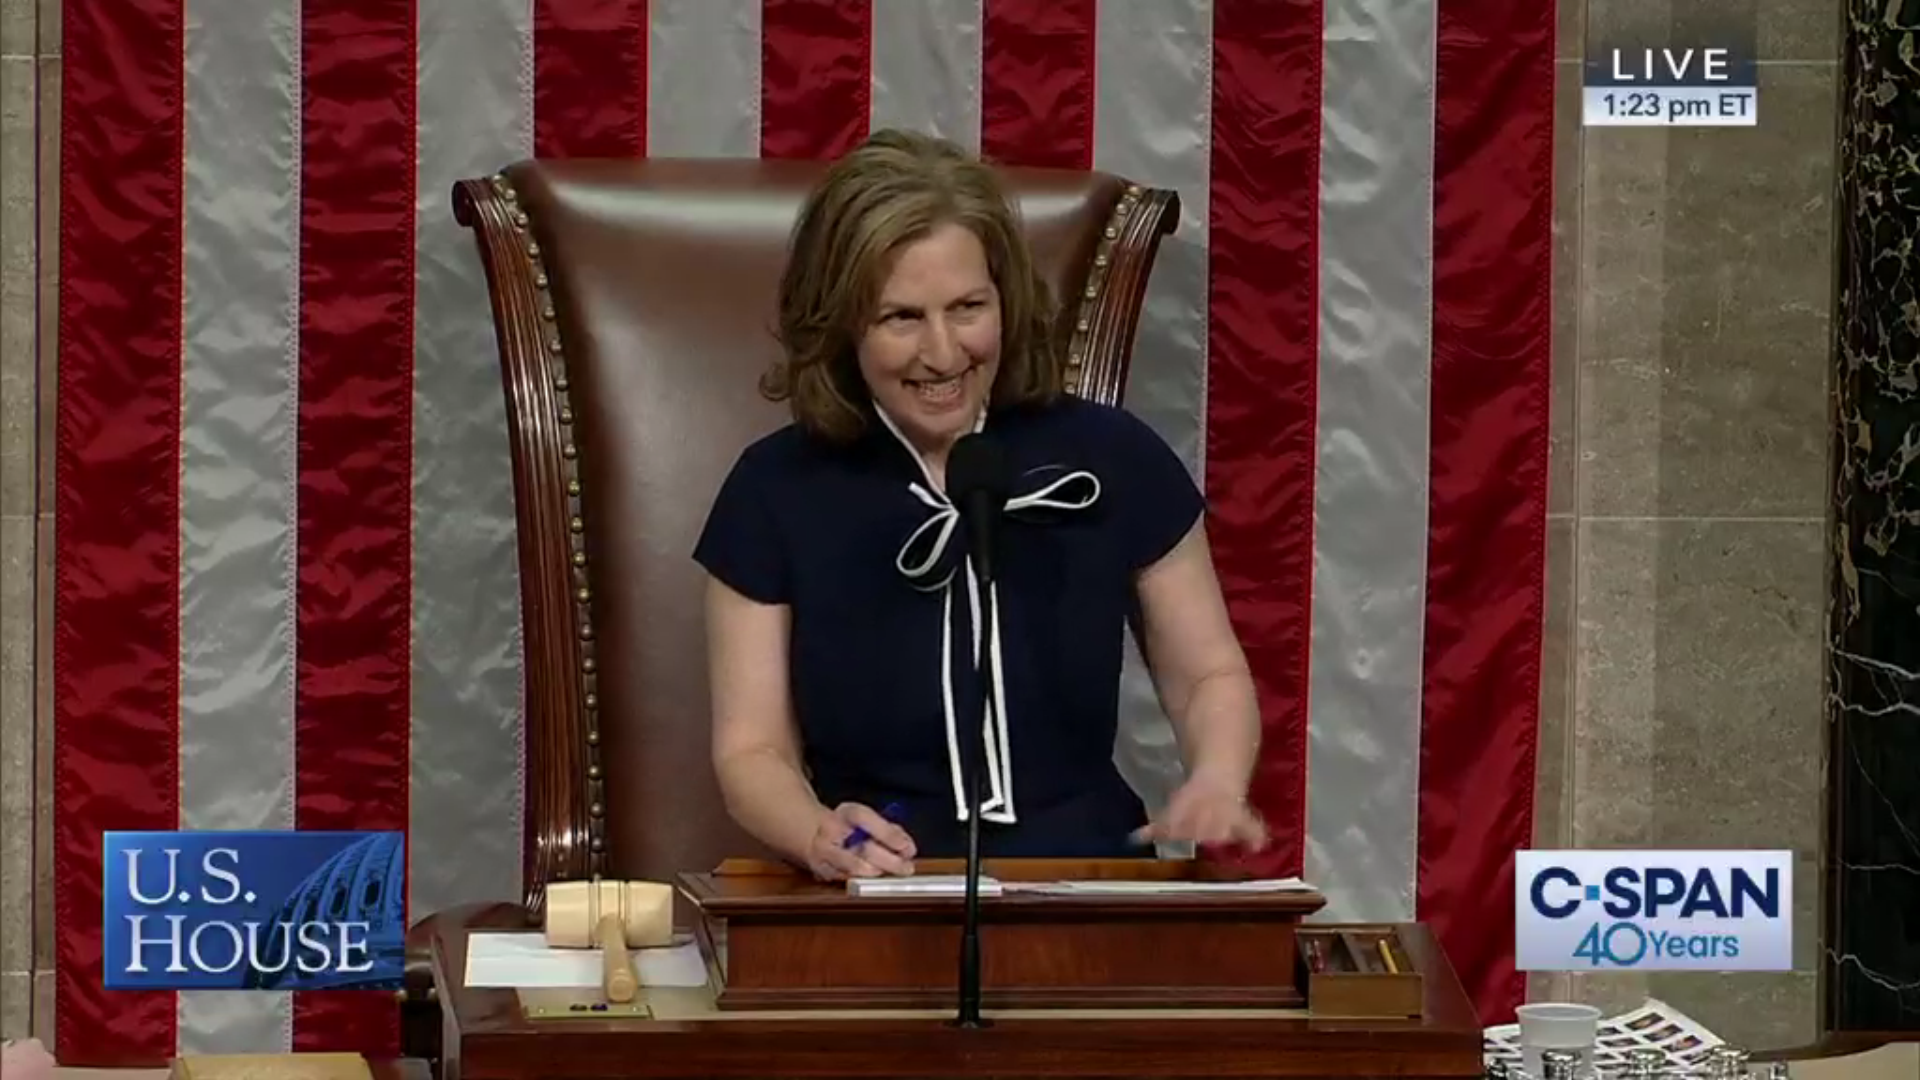 Kim Schrier presides over the U.S. House